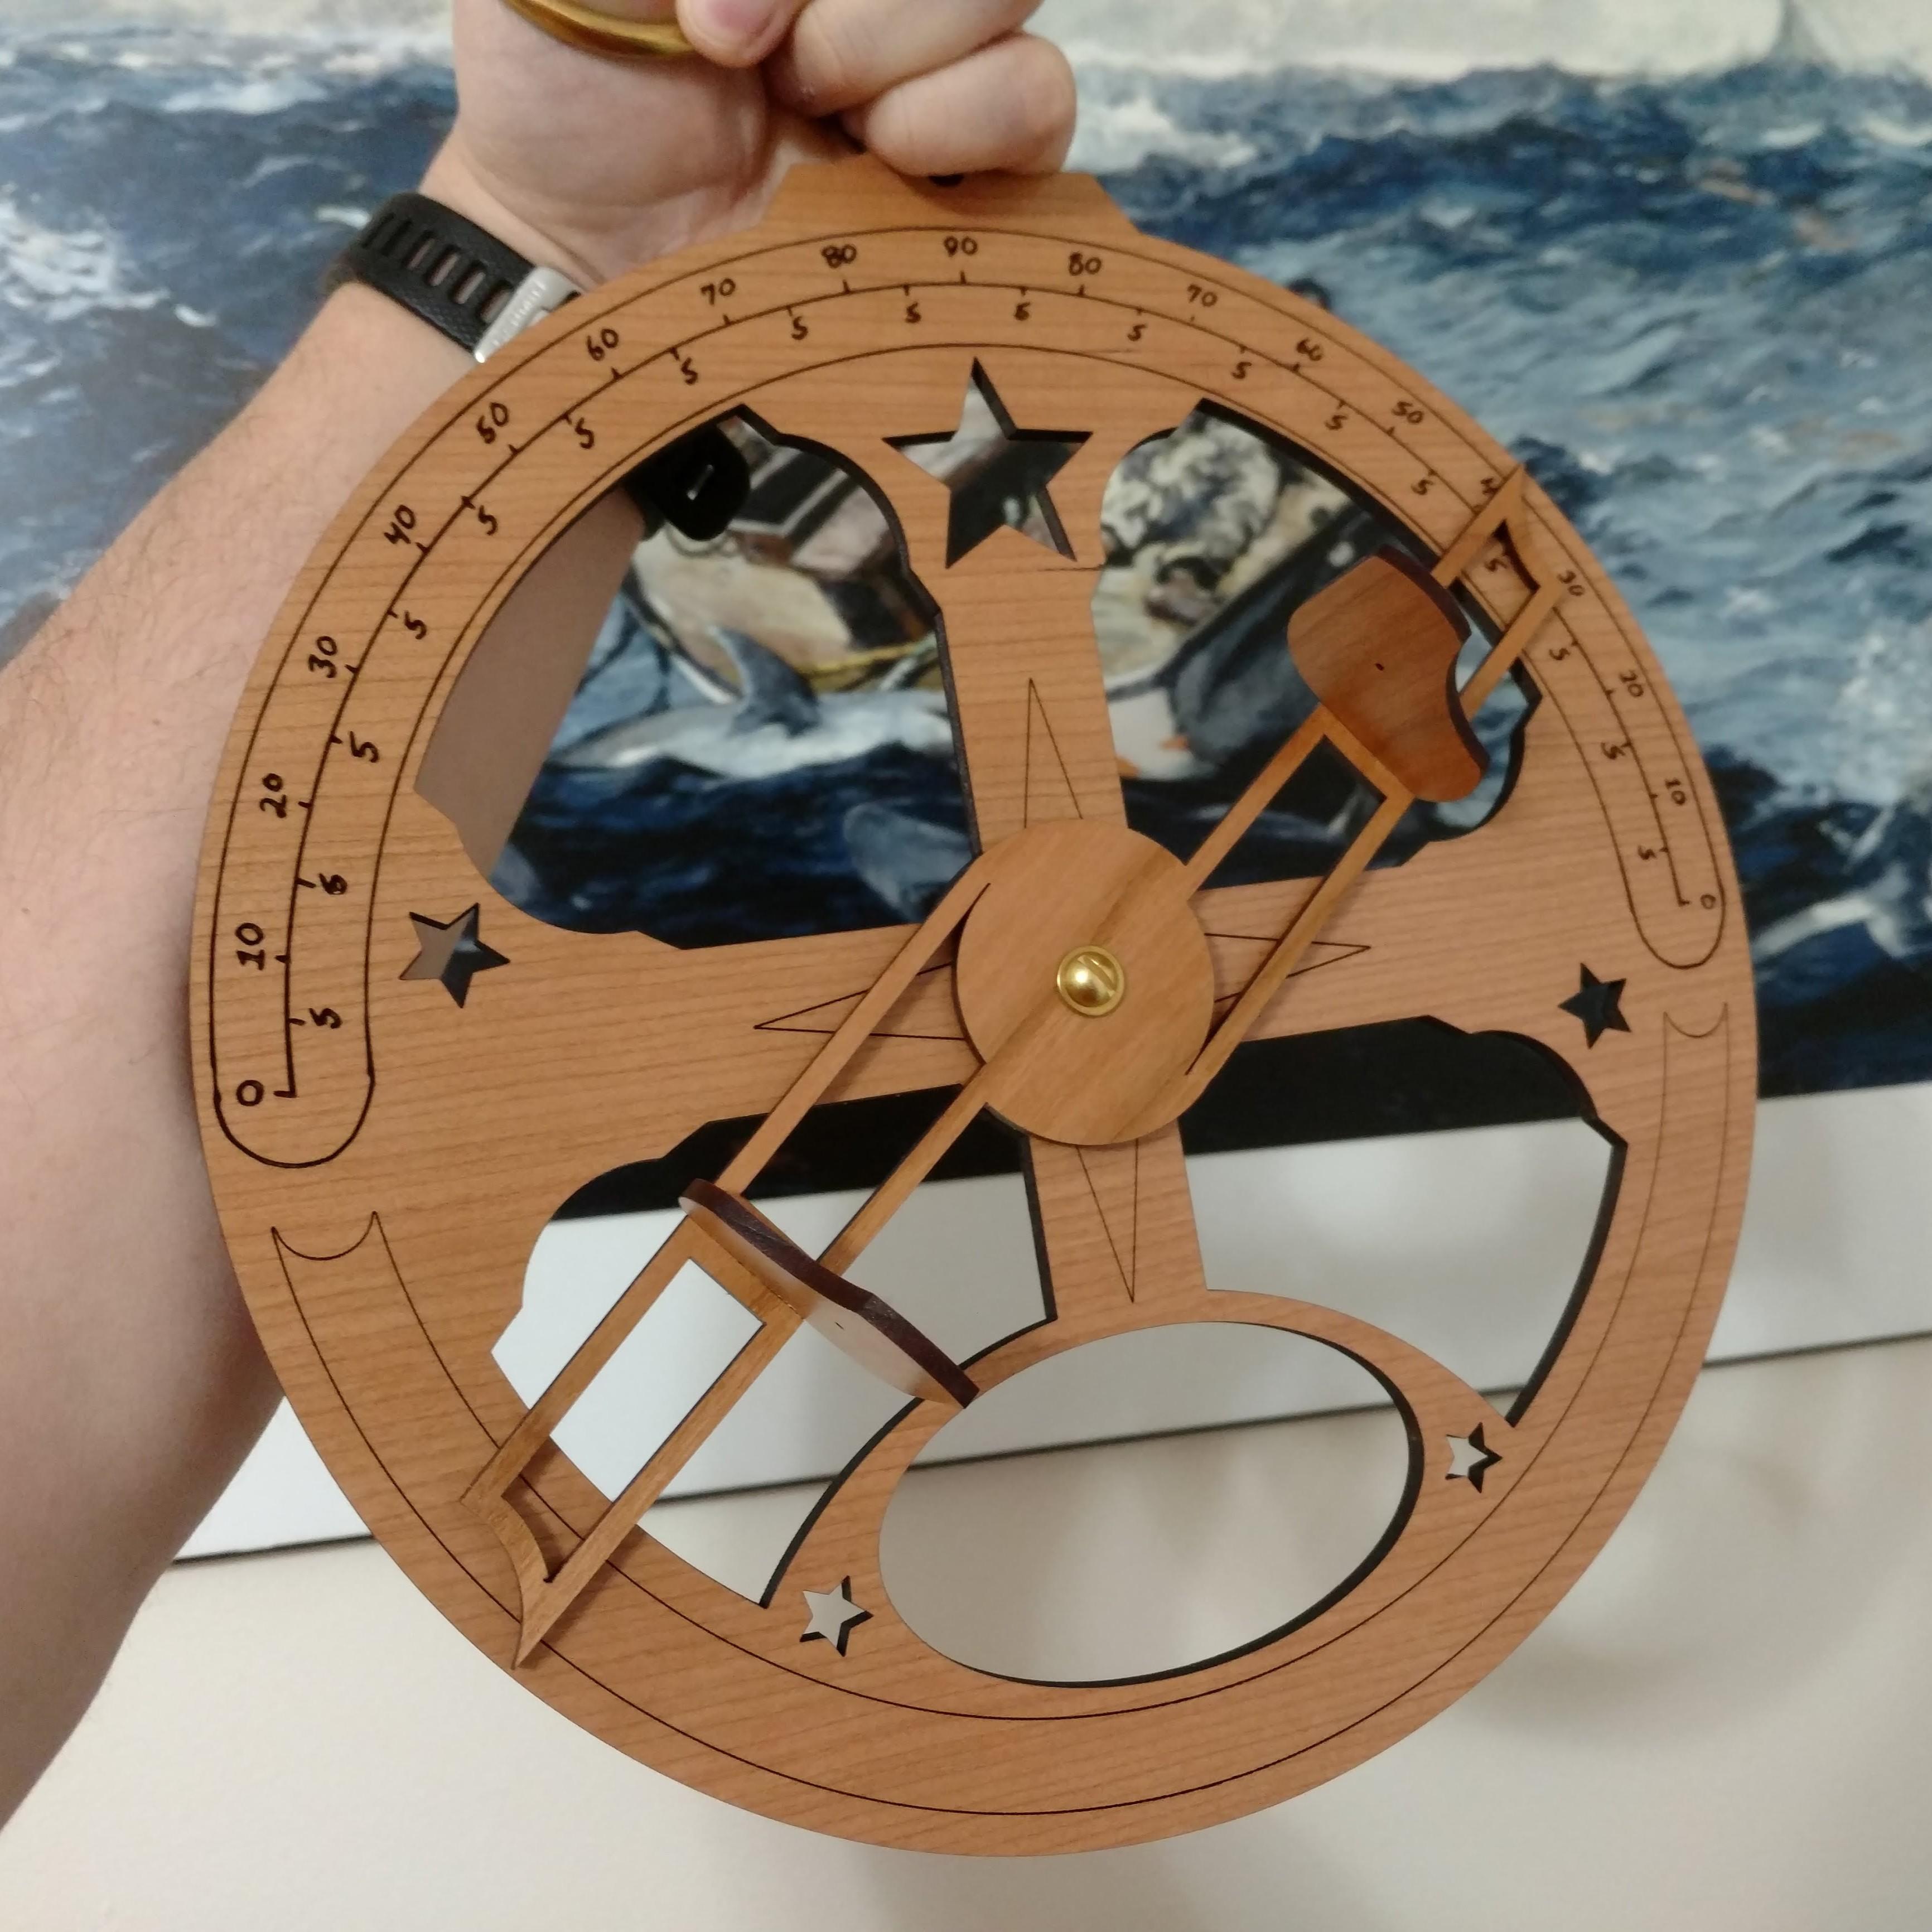 Mariner's Astrolabe